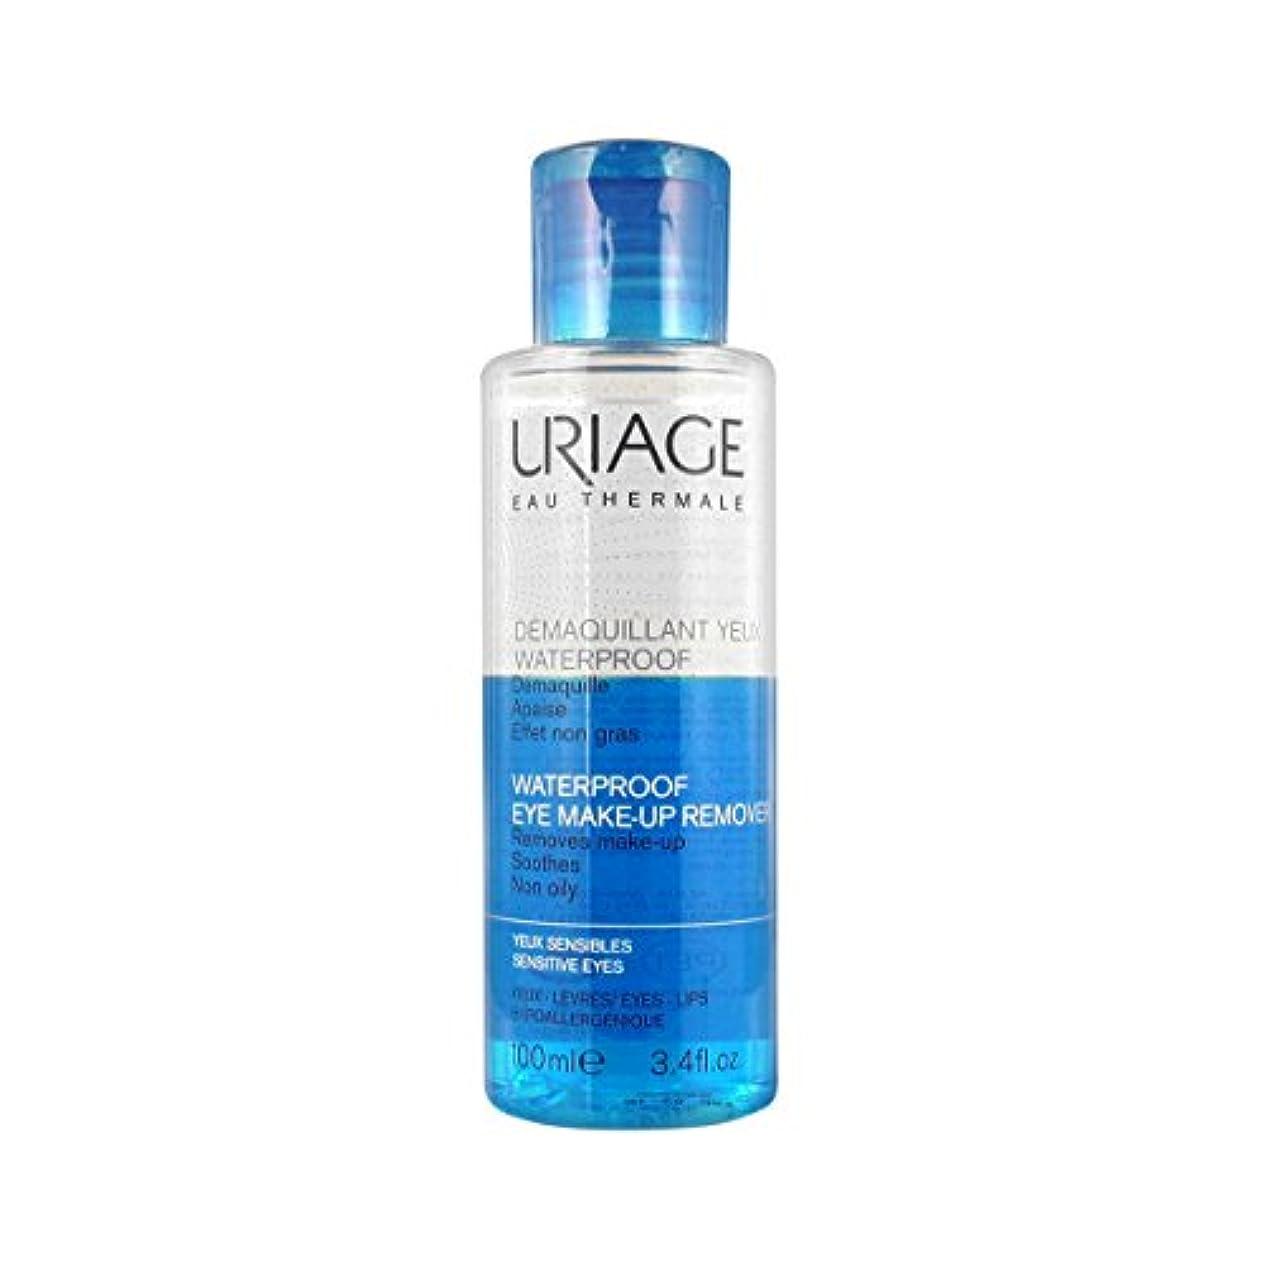 Uriage Waterproof Eye Make-up Remover 100ml [並行輸入品]